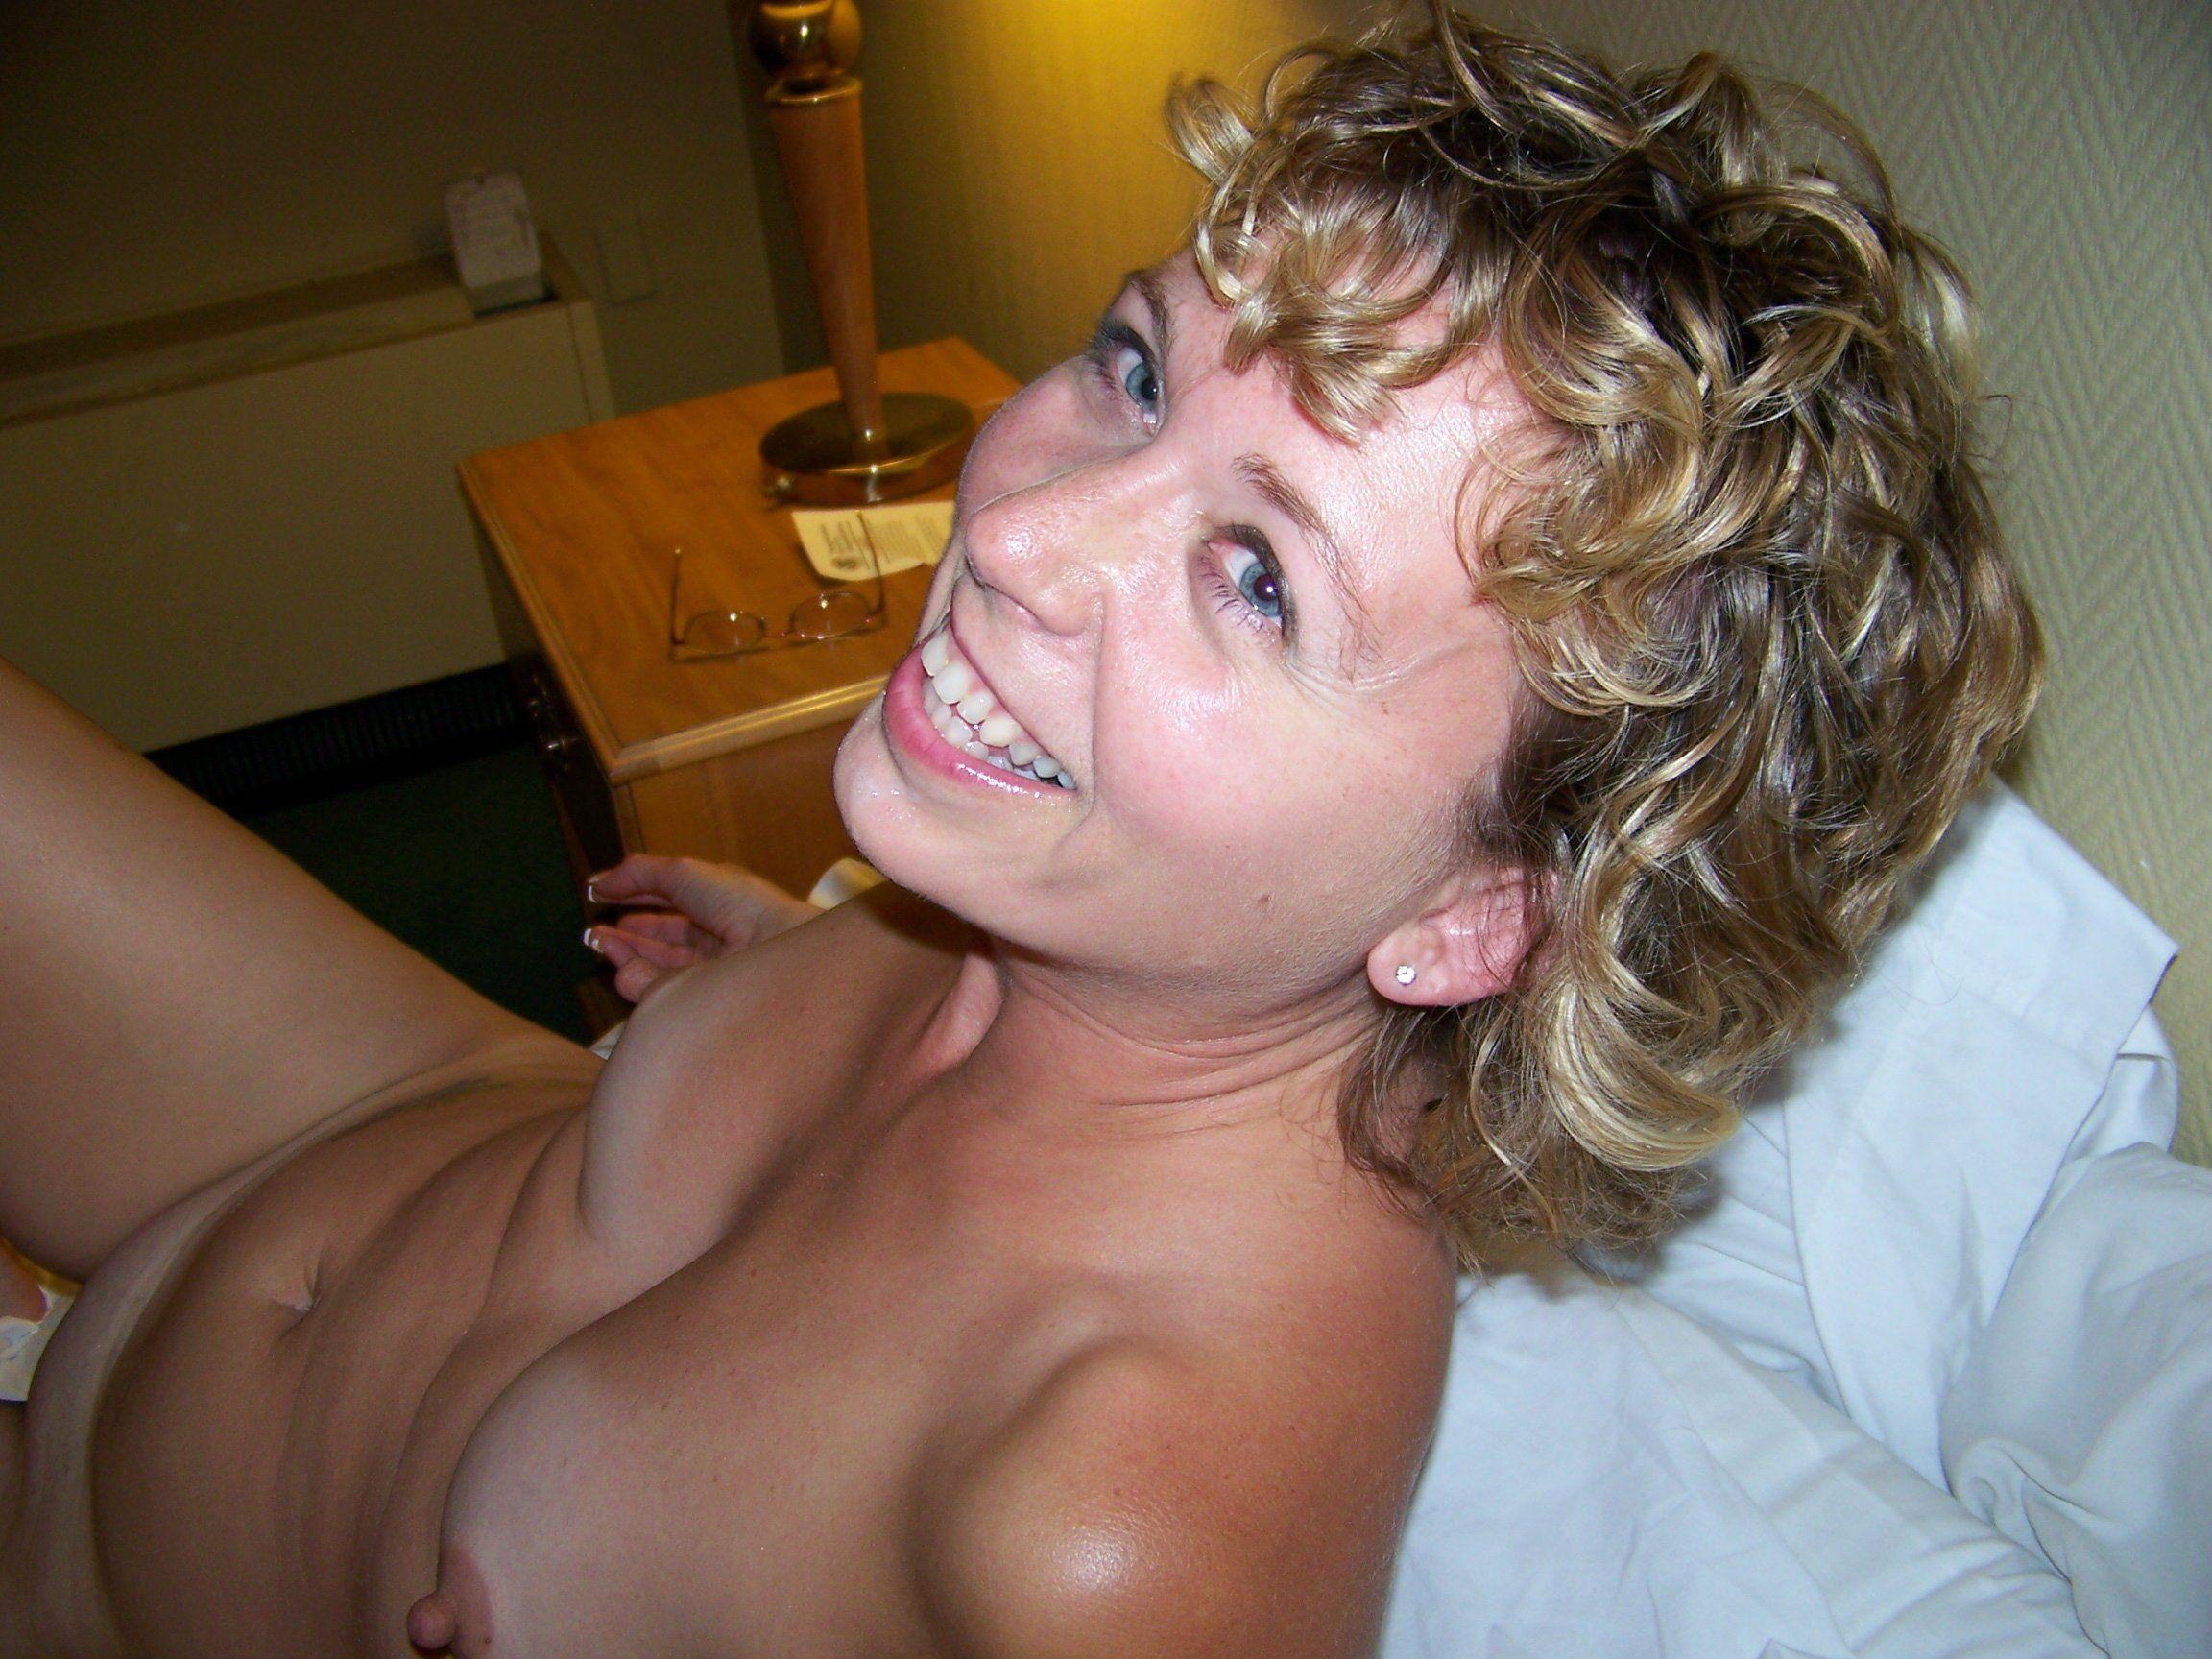 Amateur Blowjob Porn Videos wives blowjob amateur blowjob photos, videos and pics 6